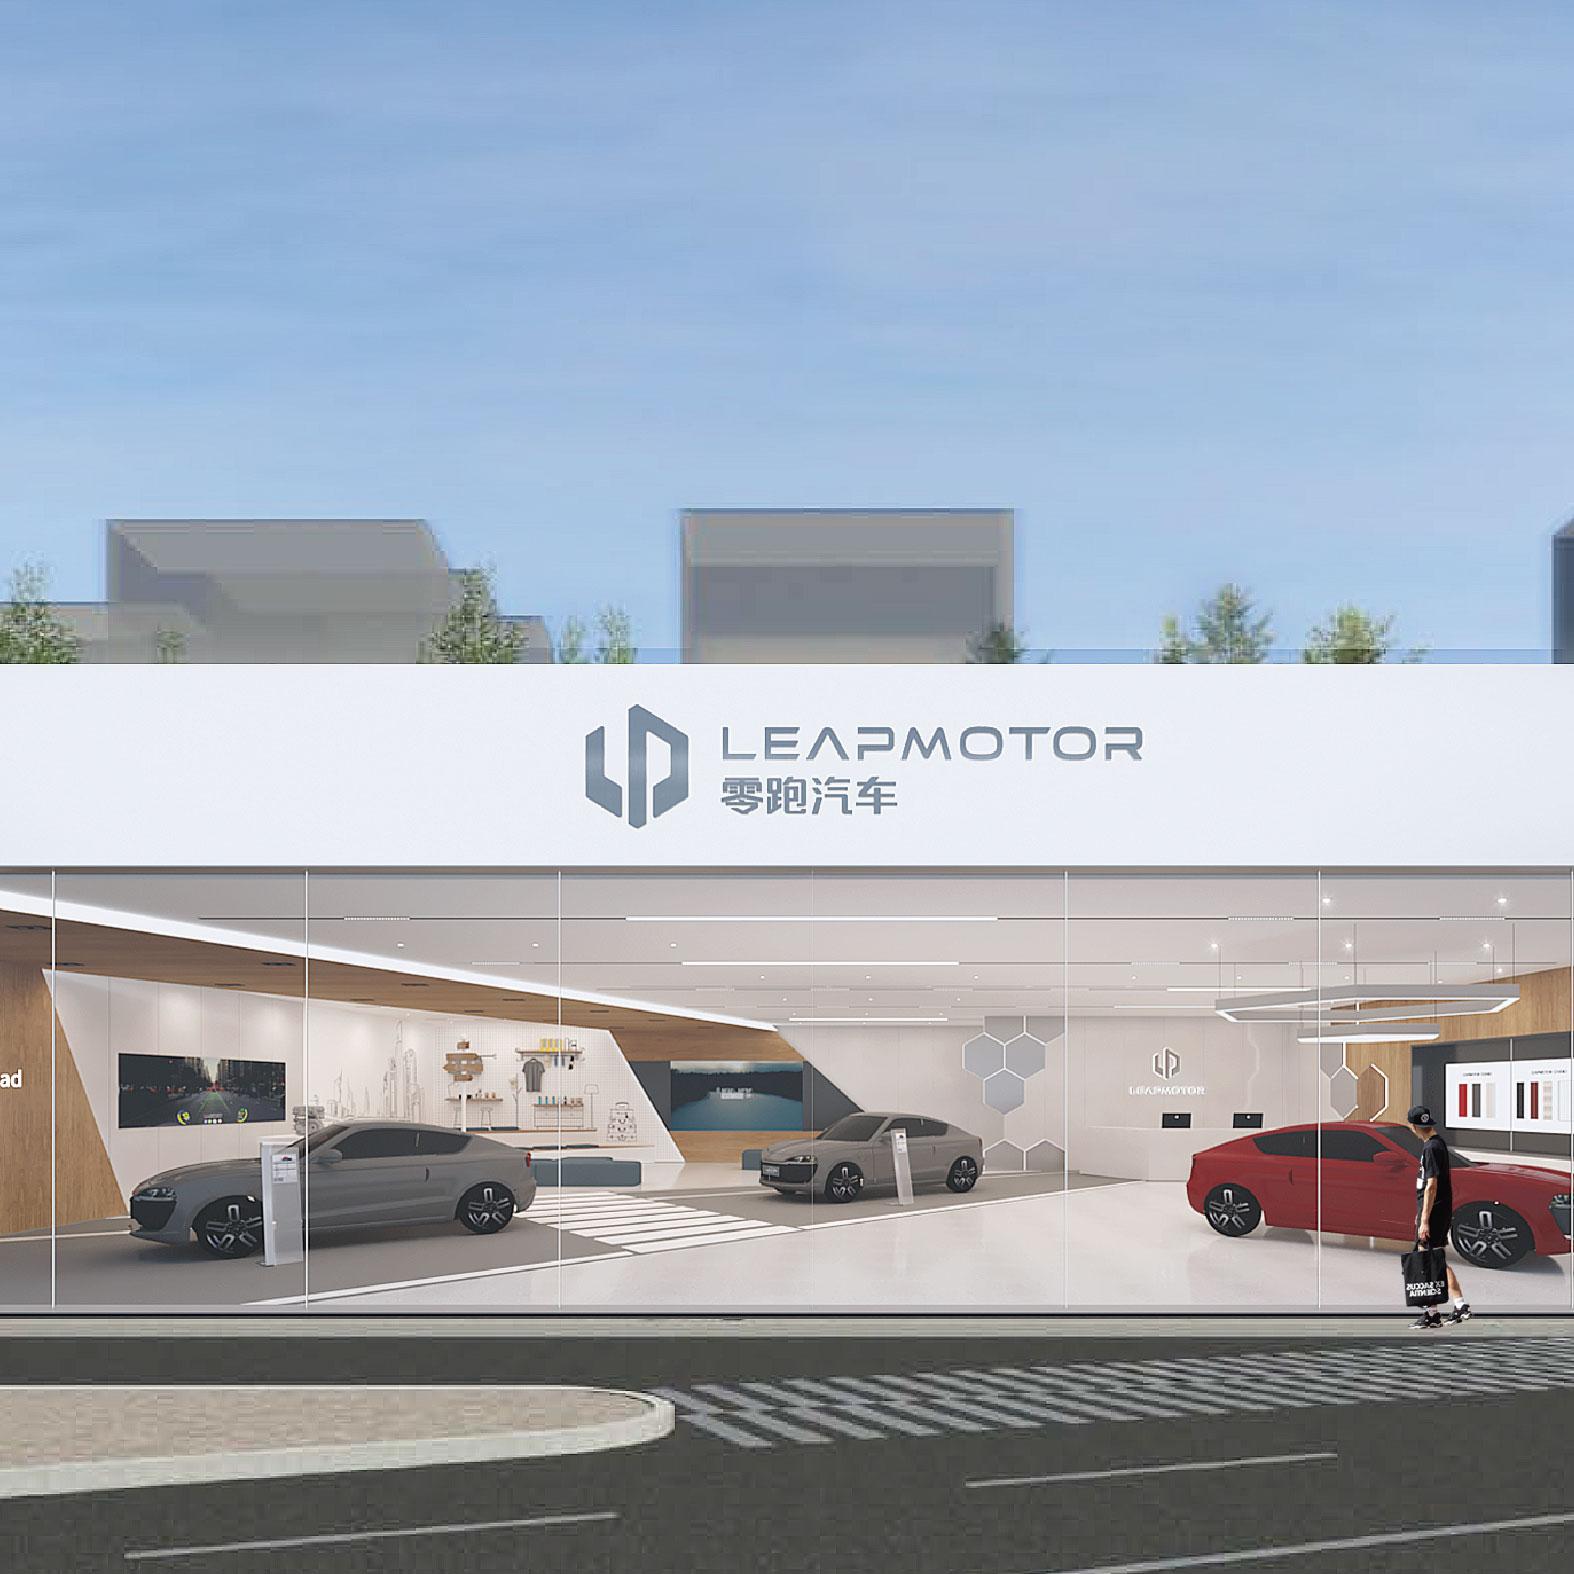 Leap Motor 체험 센터